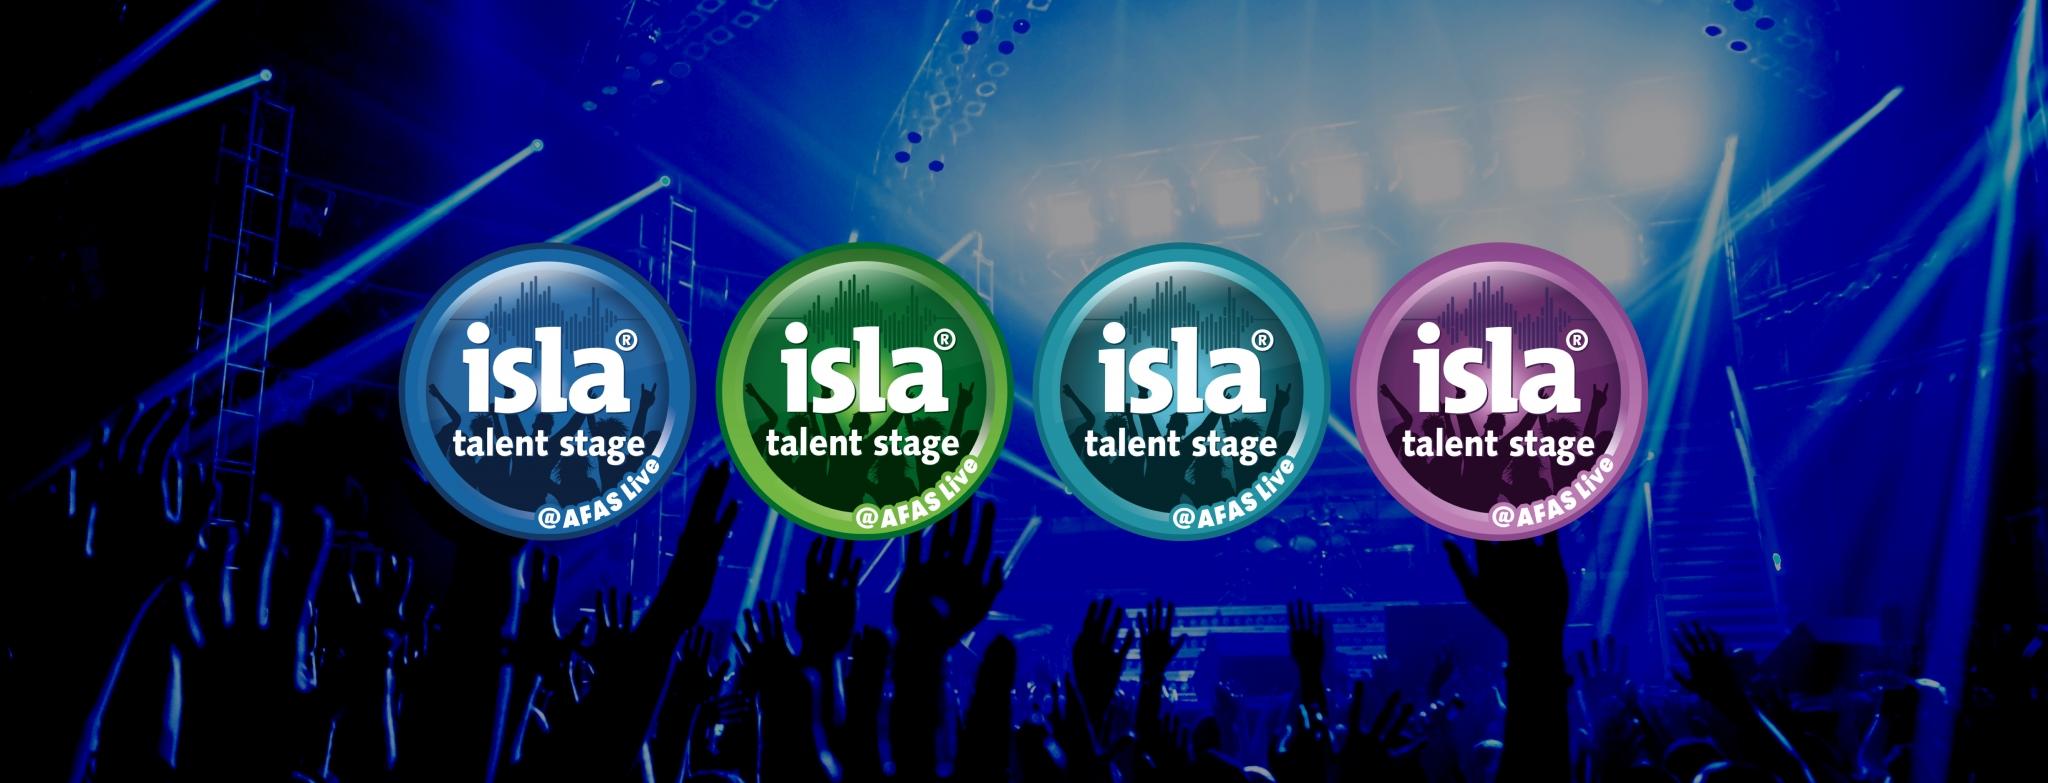 Eerste show Isla Talent Stage || AFAS Live